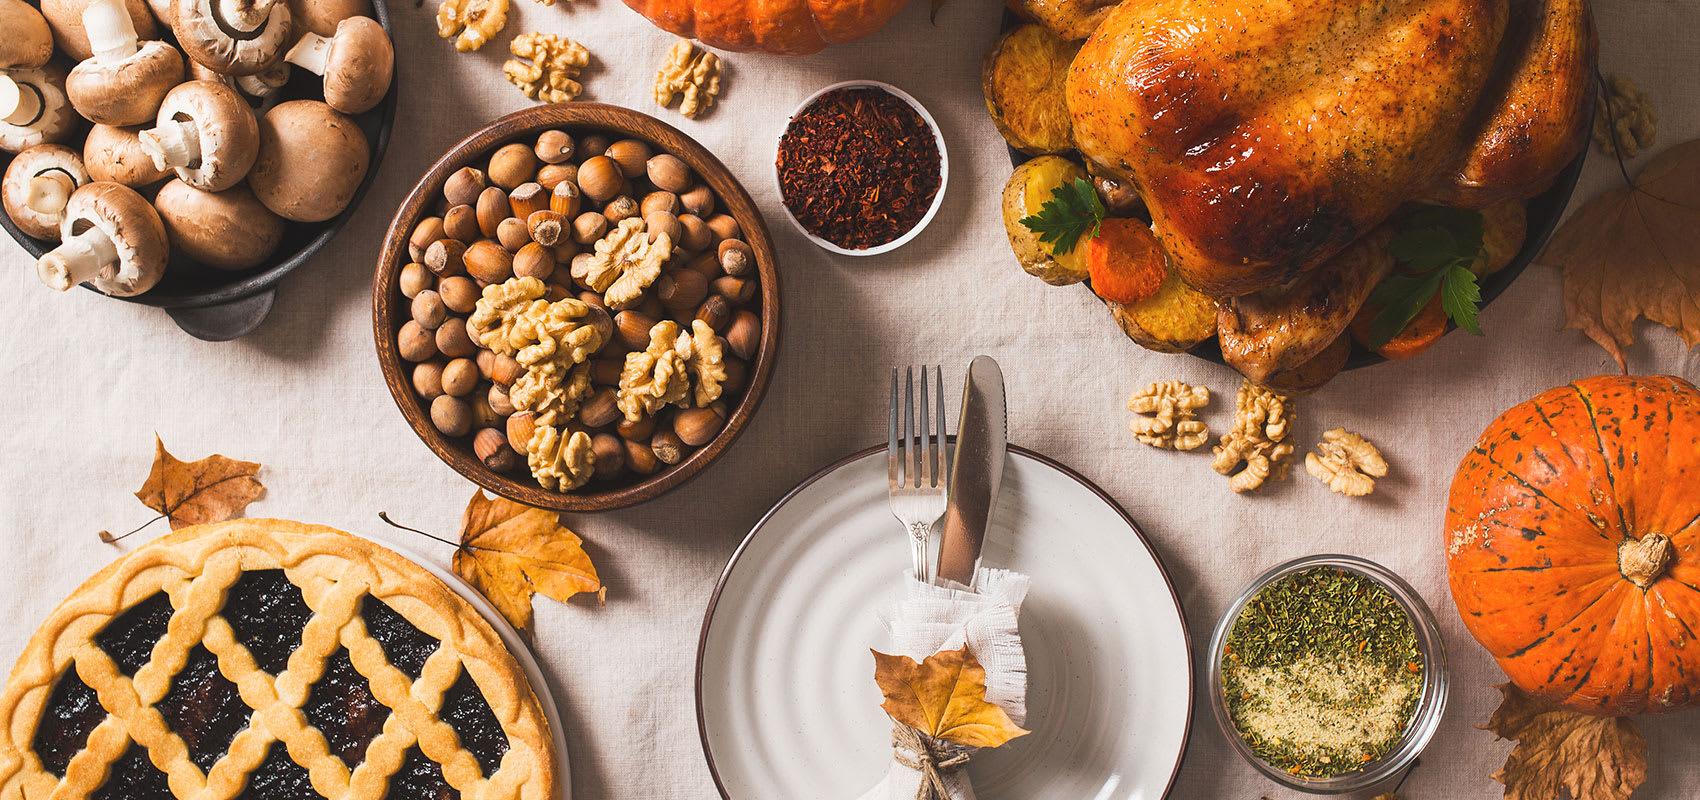 Park City Restaurants still Cookin' through the Fall Image